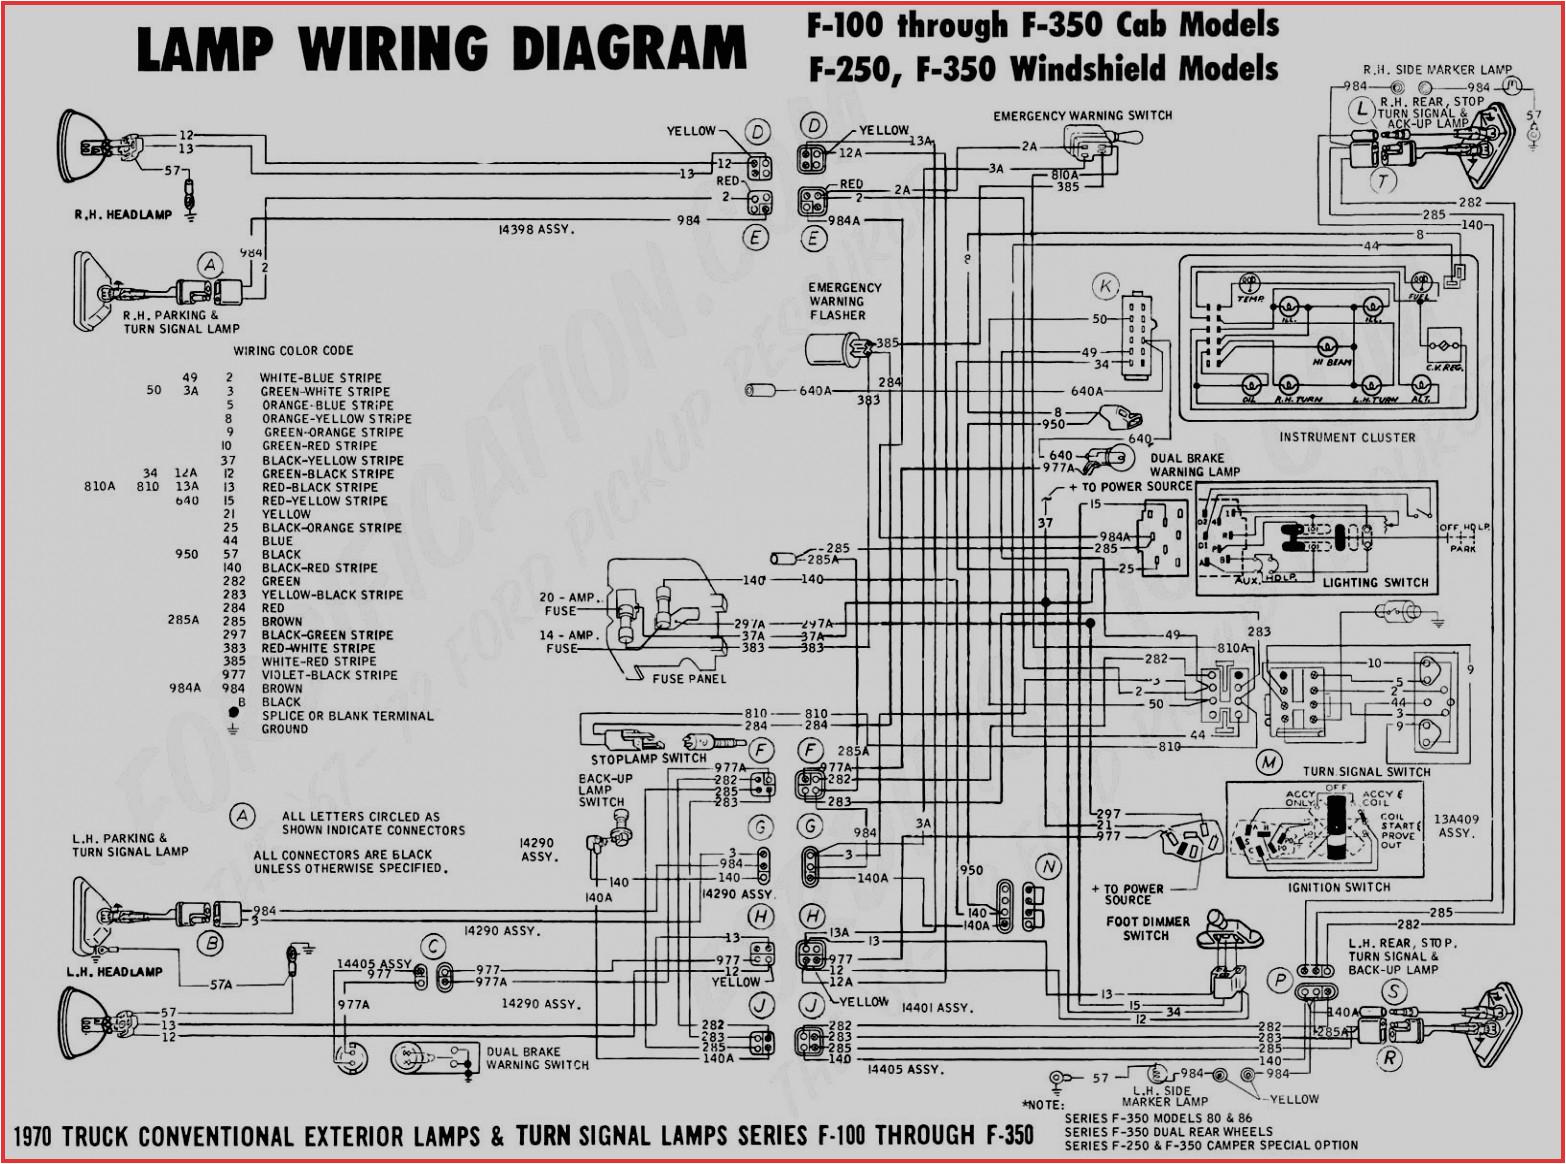 1985 peterbilt 359 wiring diagram ford ranger 2012 trailer wiring diagram automotive wiring diagrams